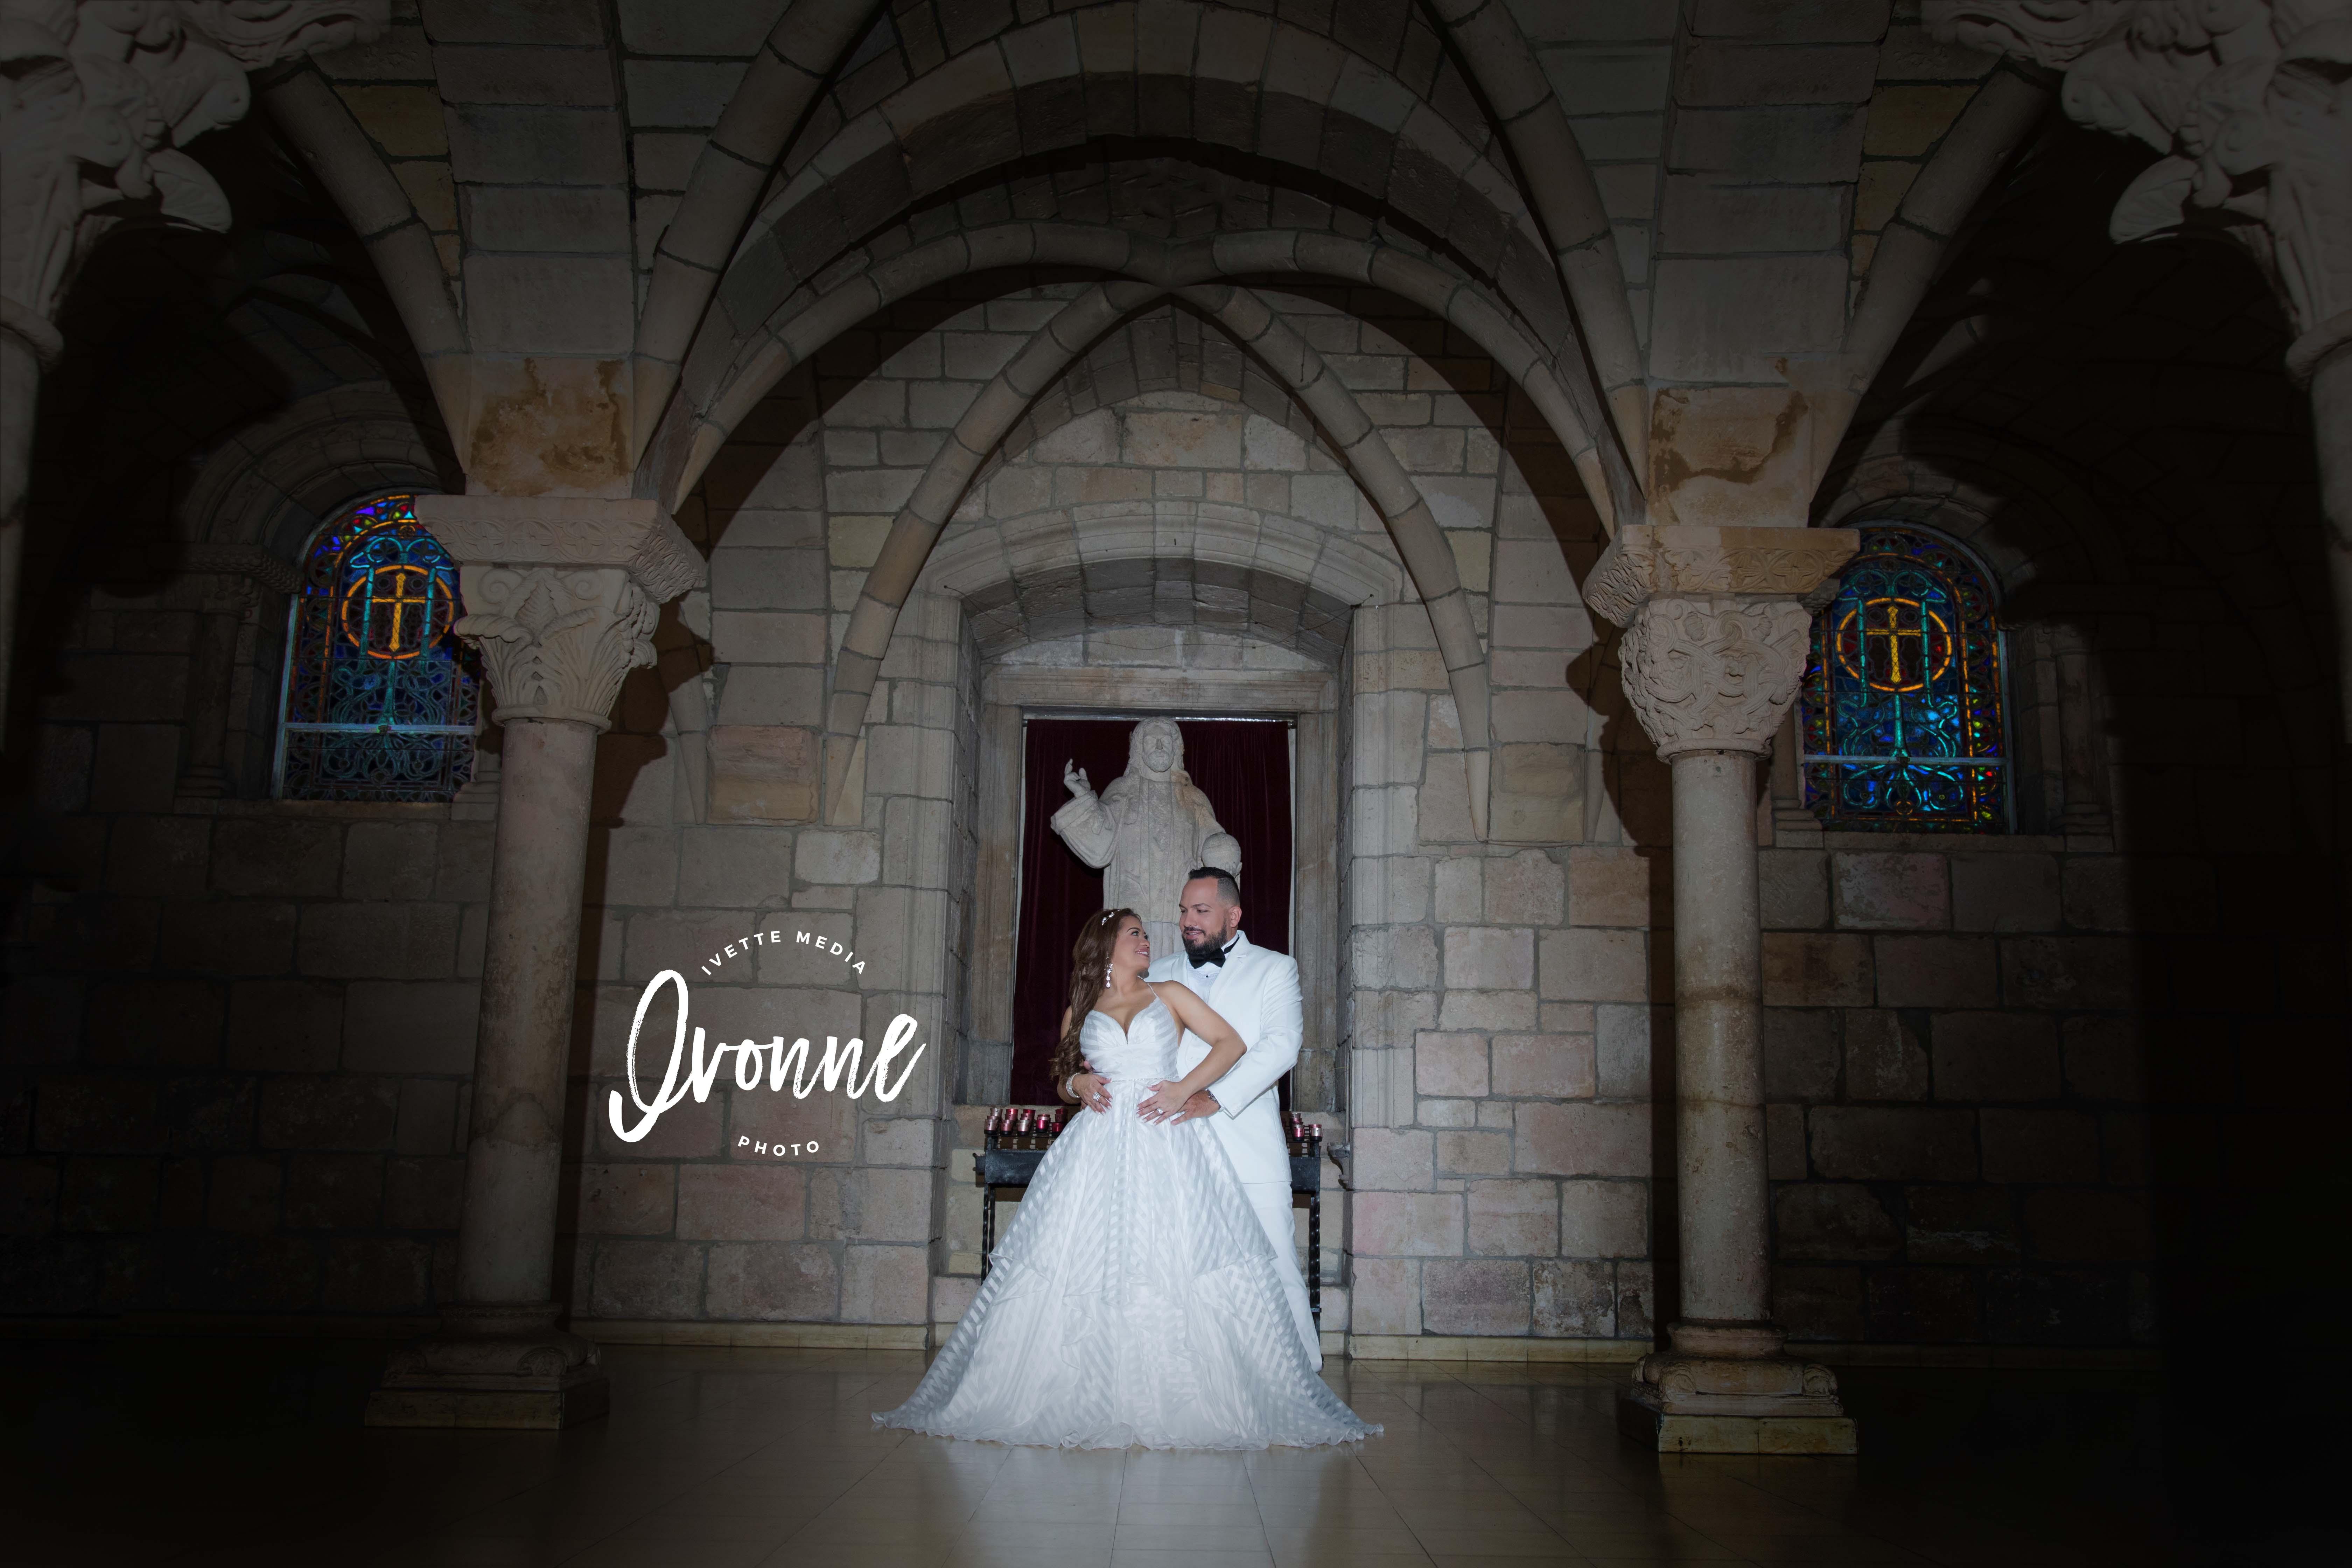 Yvonne & Yender Eng 353A9885 IG edd